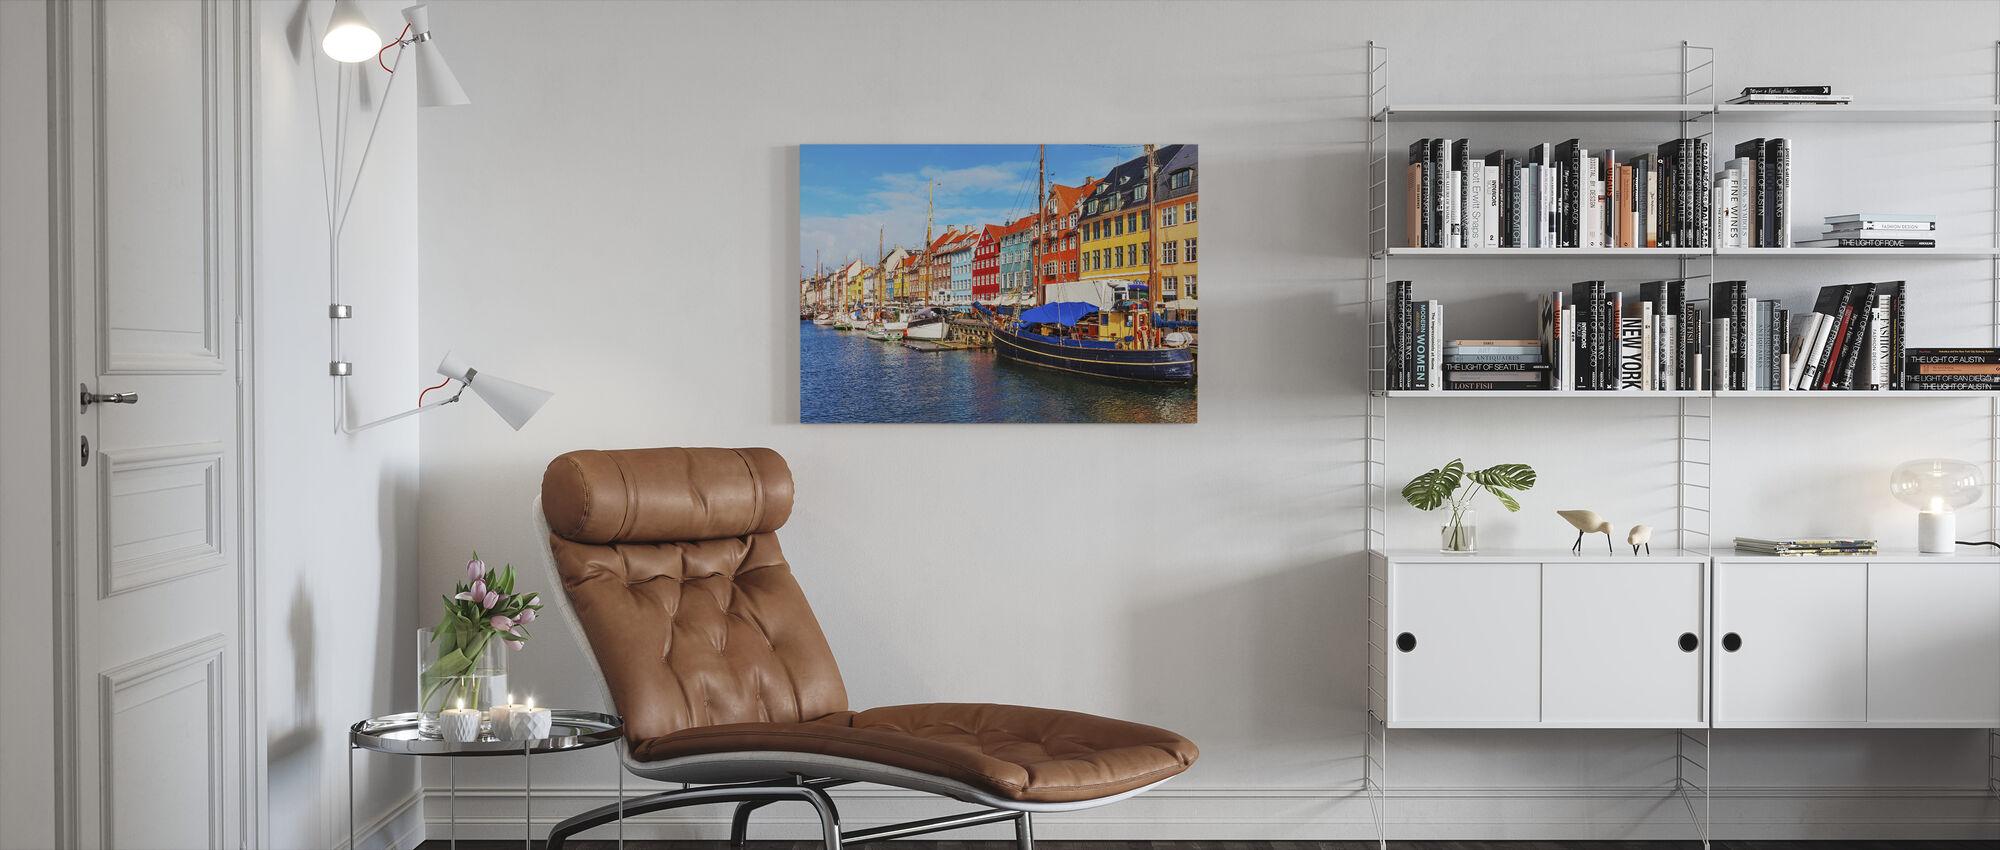 Sommar Vy över Nyhavn Pier - Canvastavla - Vardagsrum